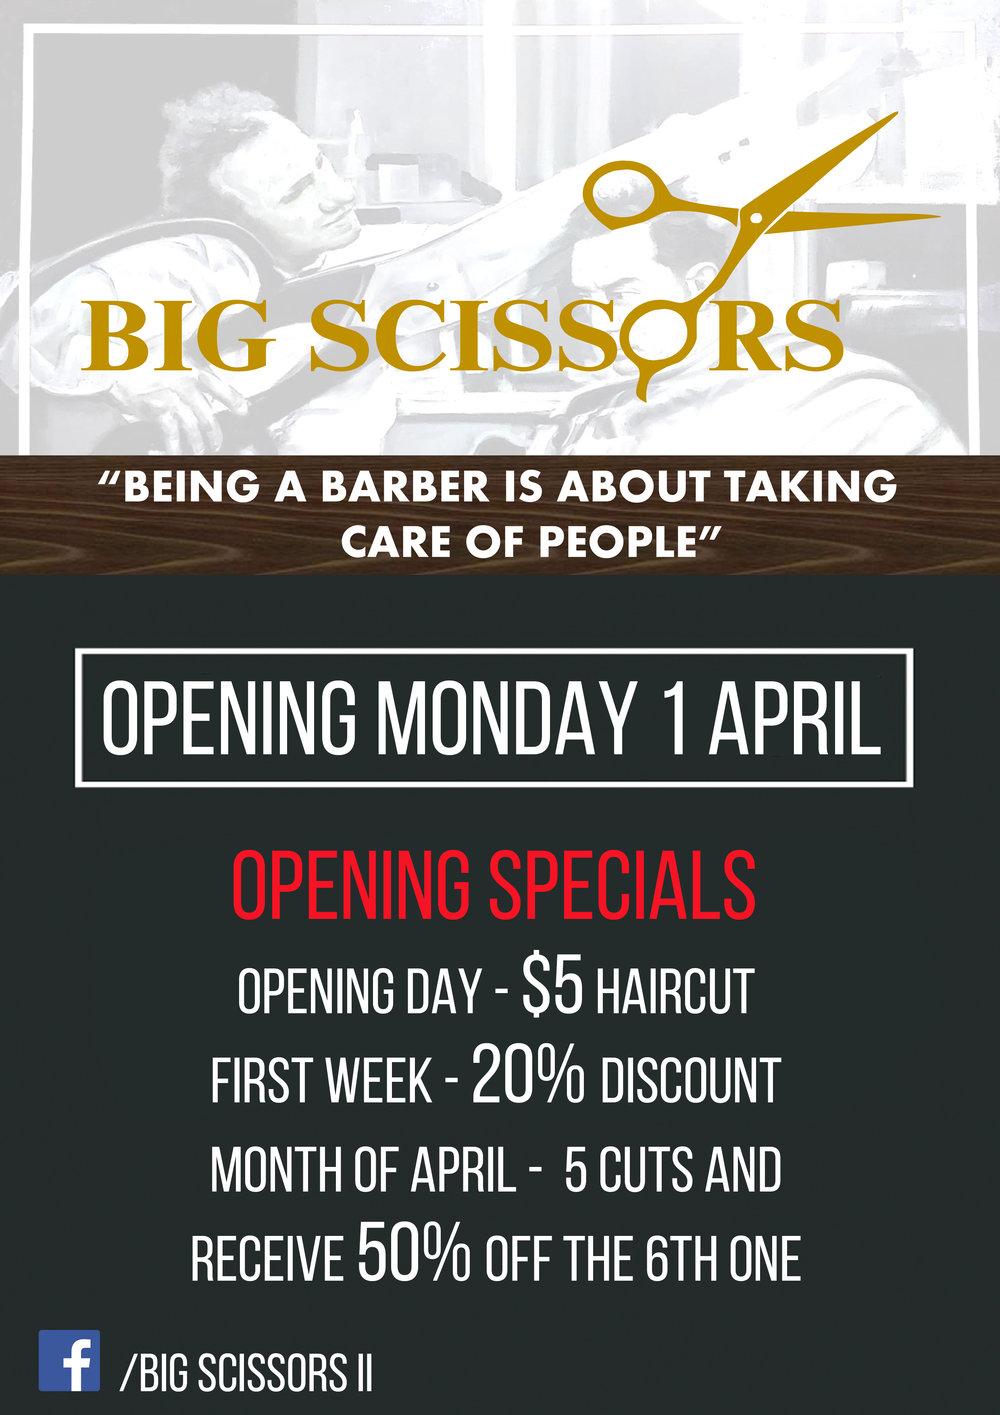 Big Scissors Opening.jpg